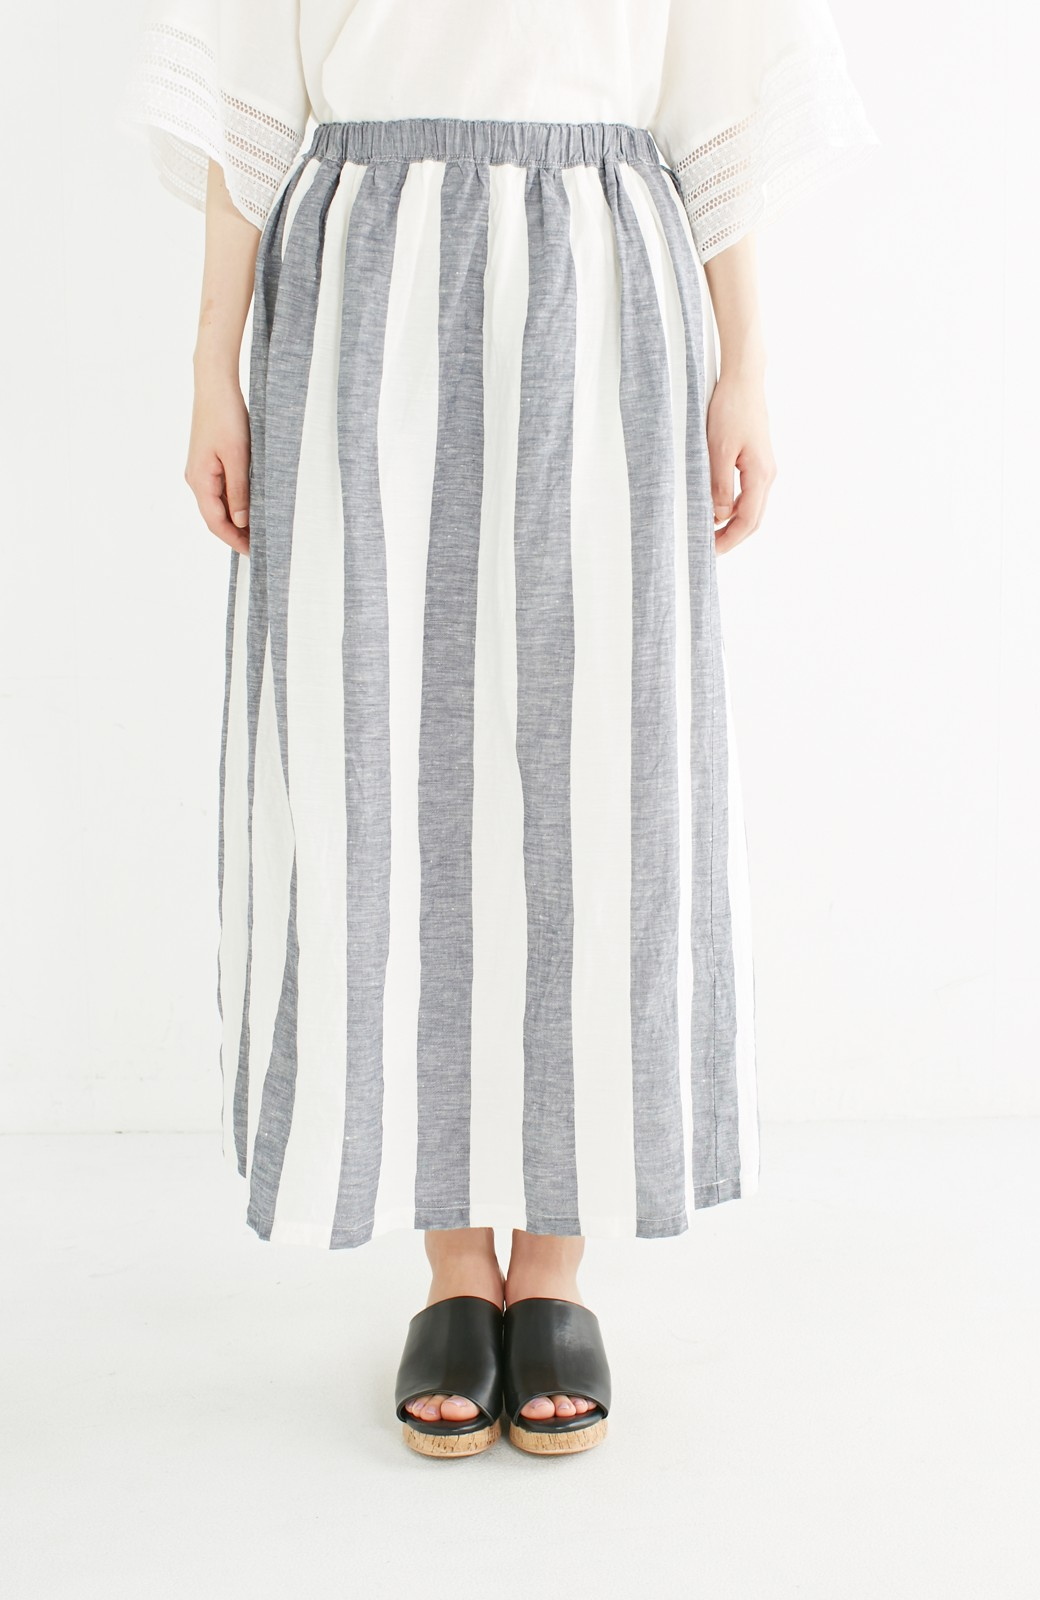 haco! てとひとて miho umezawa ストライプツーピースドレス <ホワイト×ブルー>の商品写真14